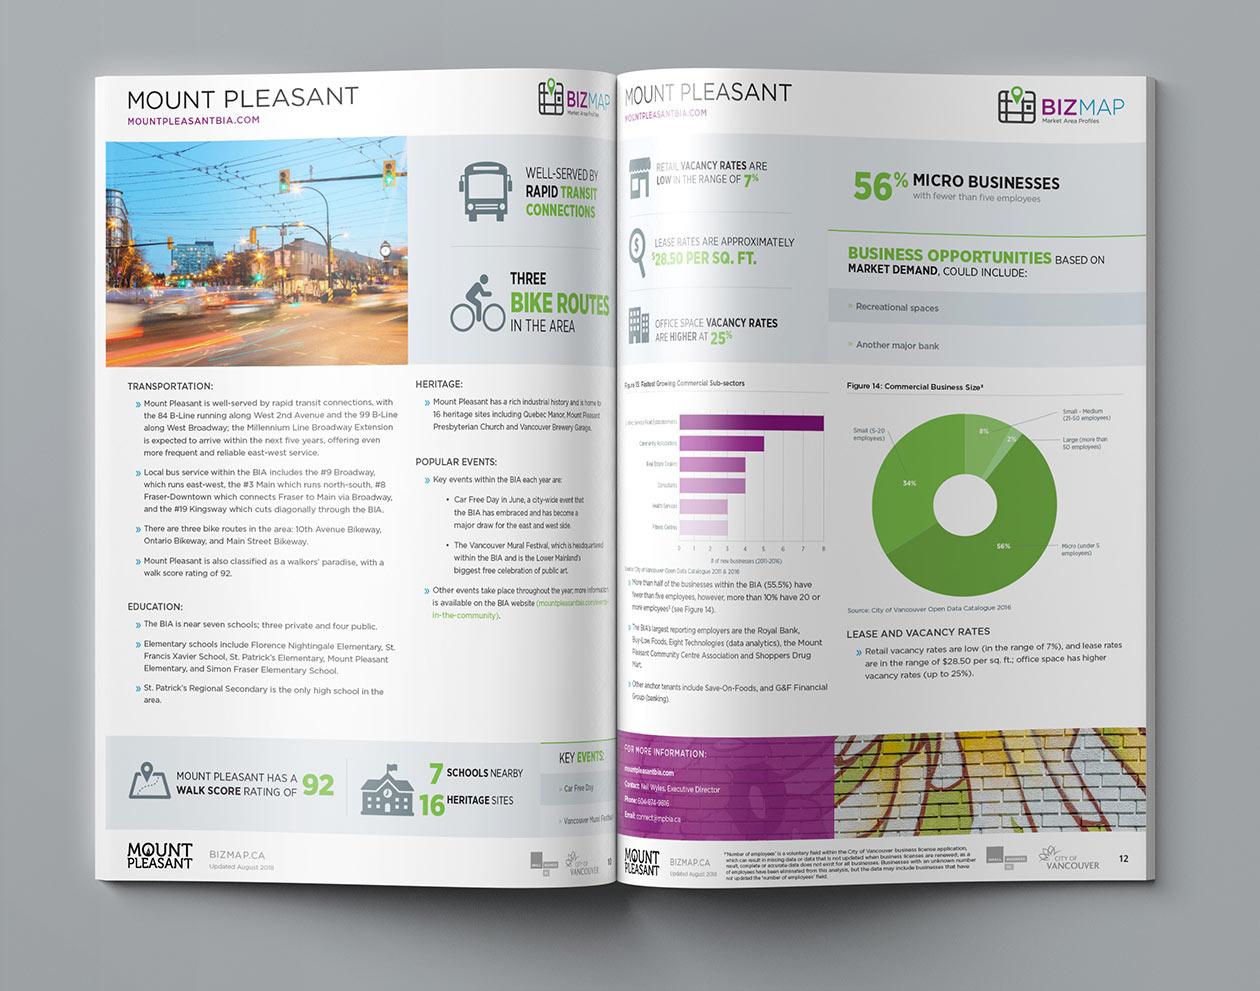 Small Business BC BizMap BIA Profiles Mount Pleasant